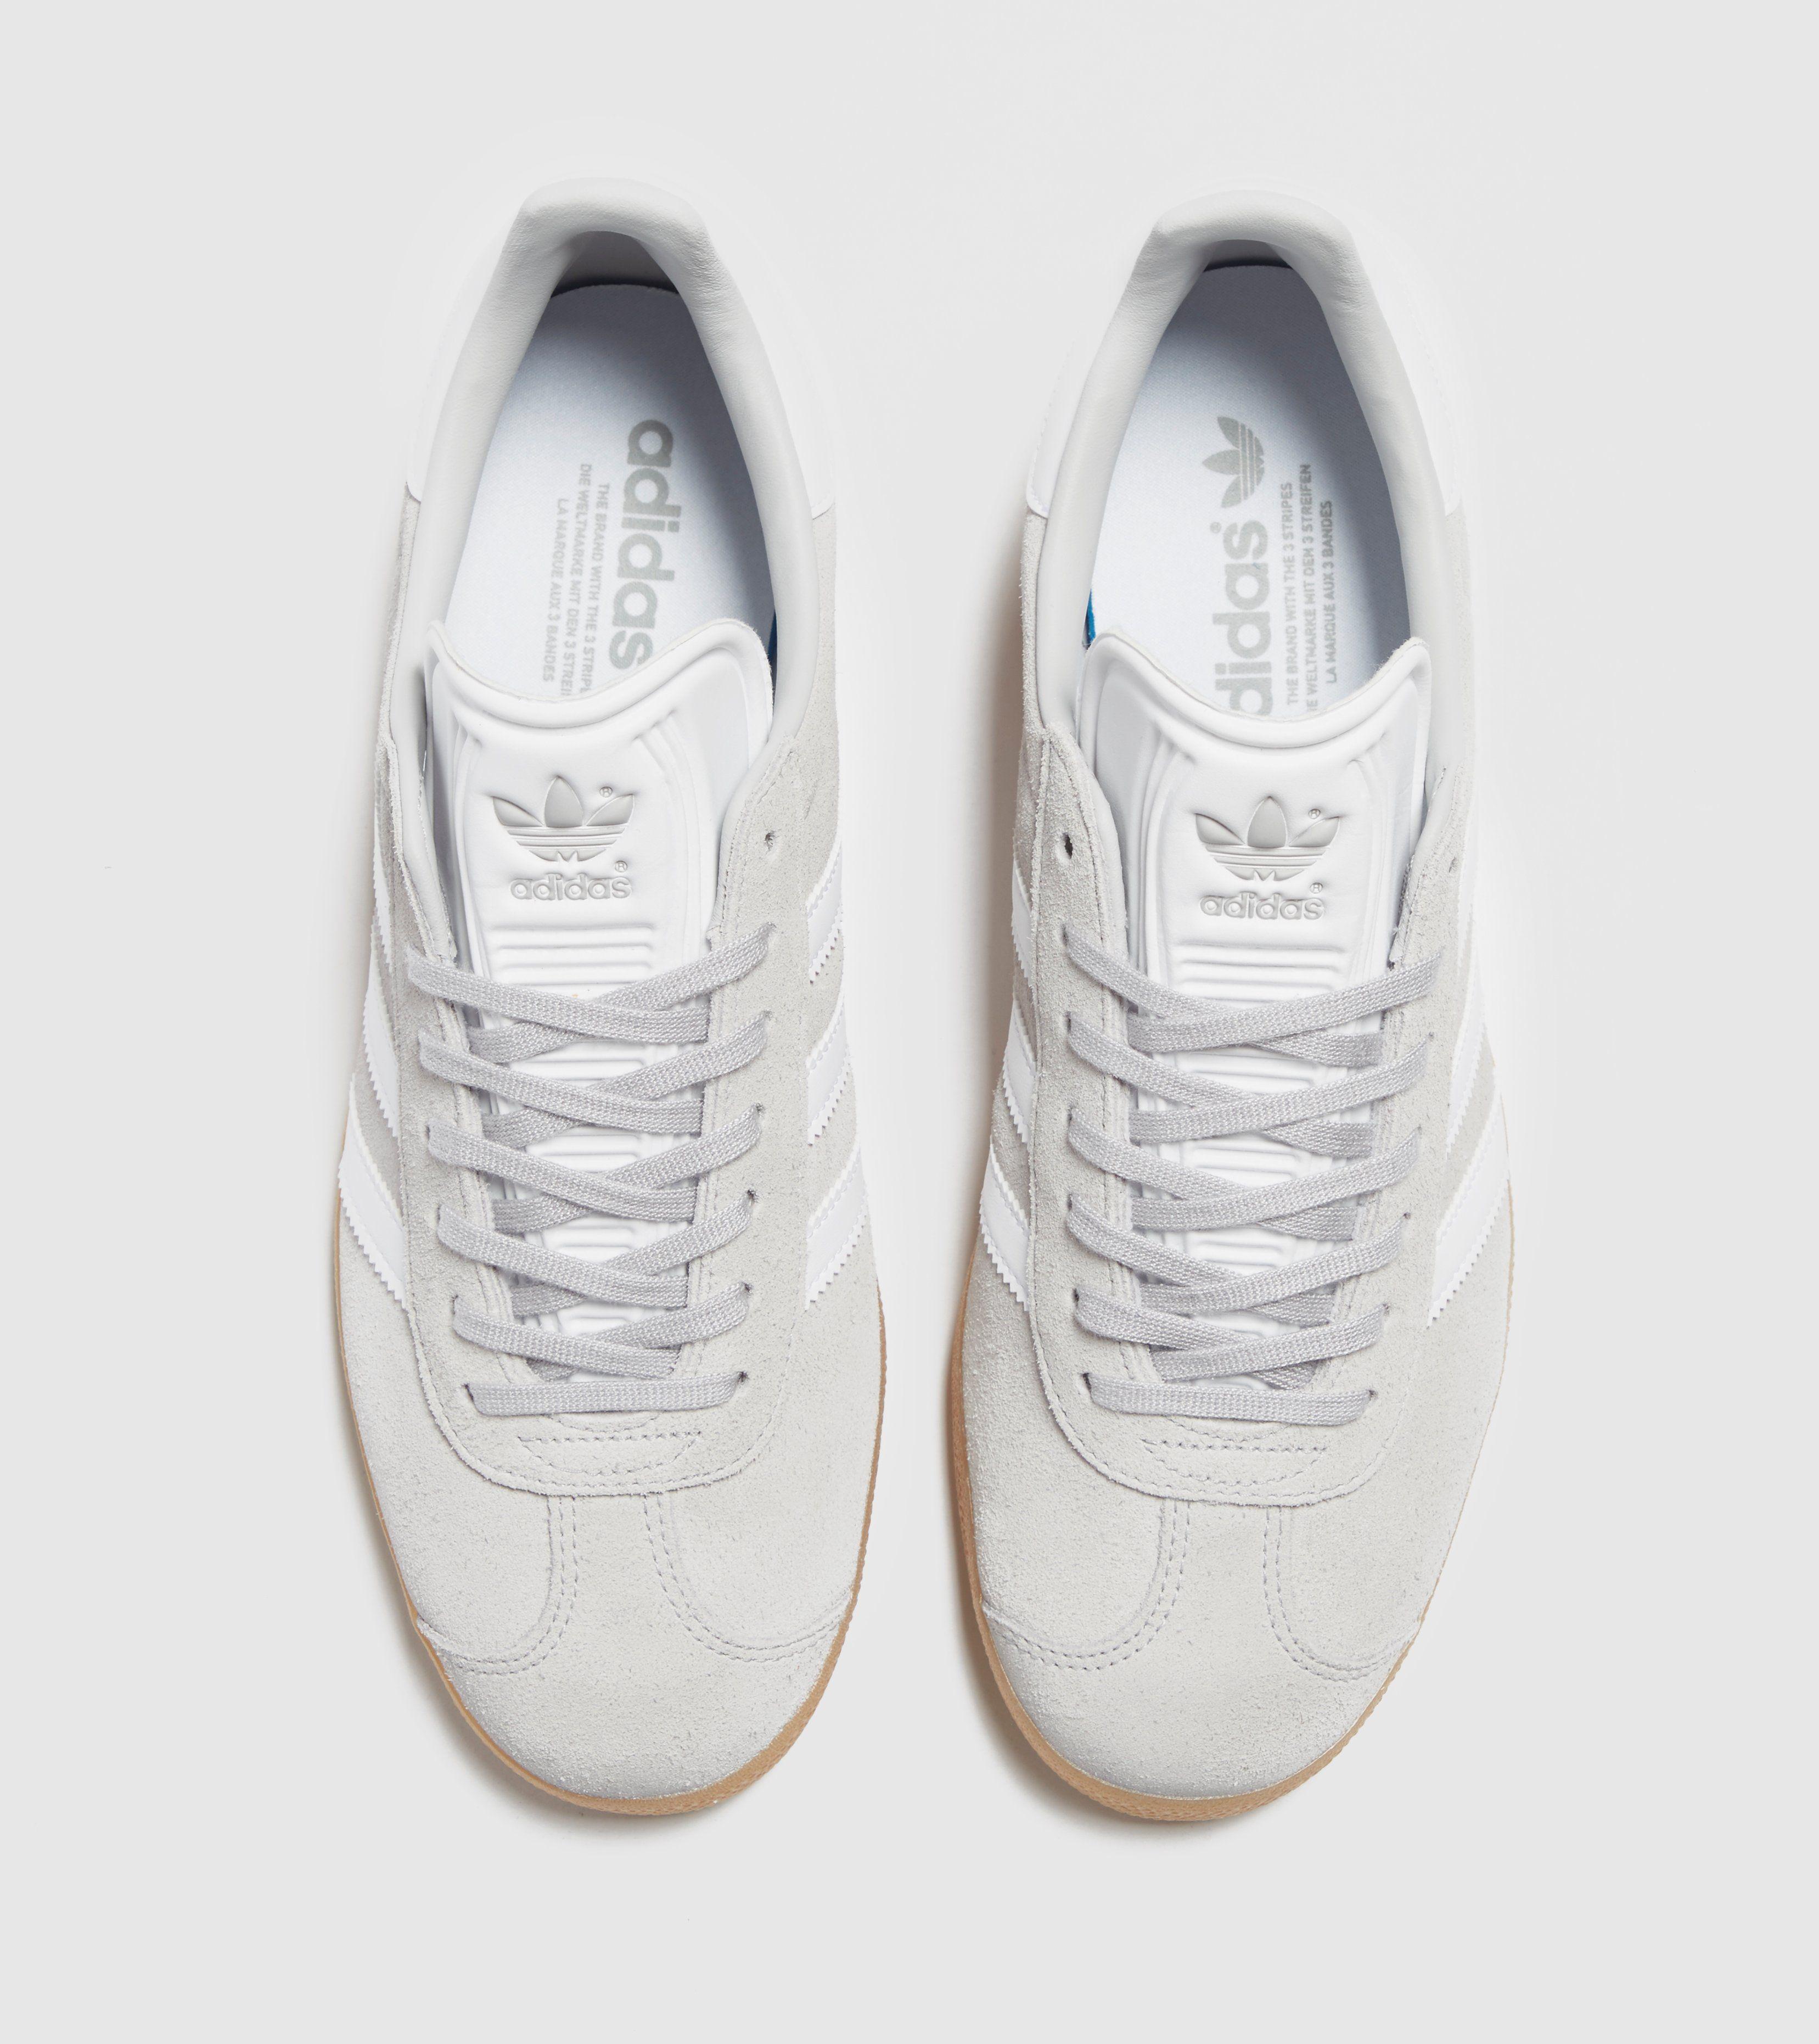 adidas Originals Gazelle